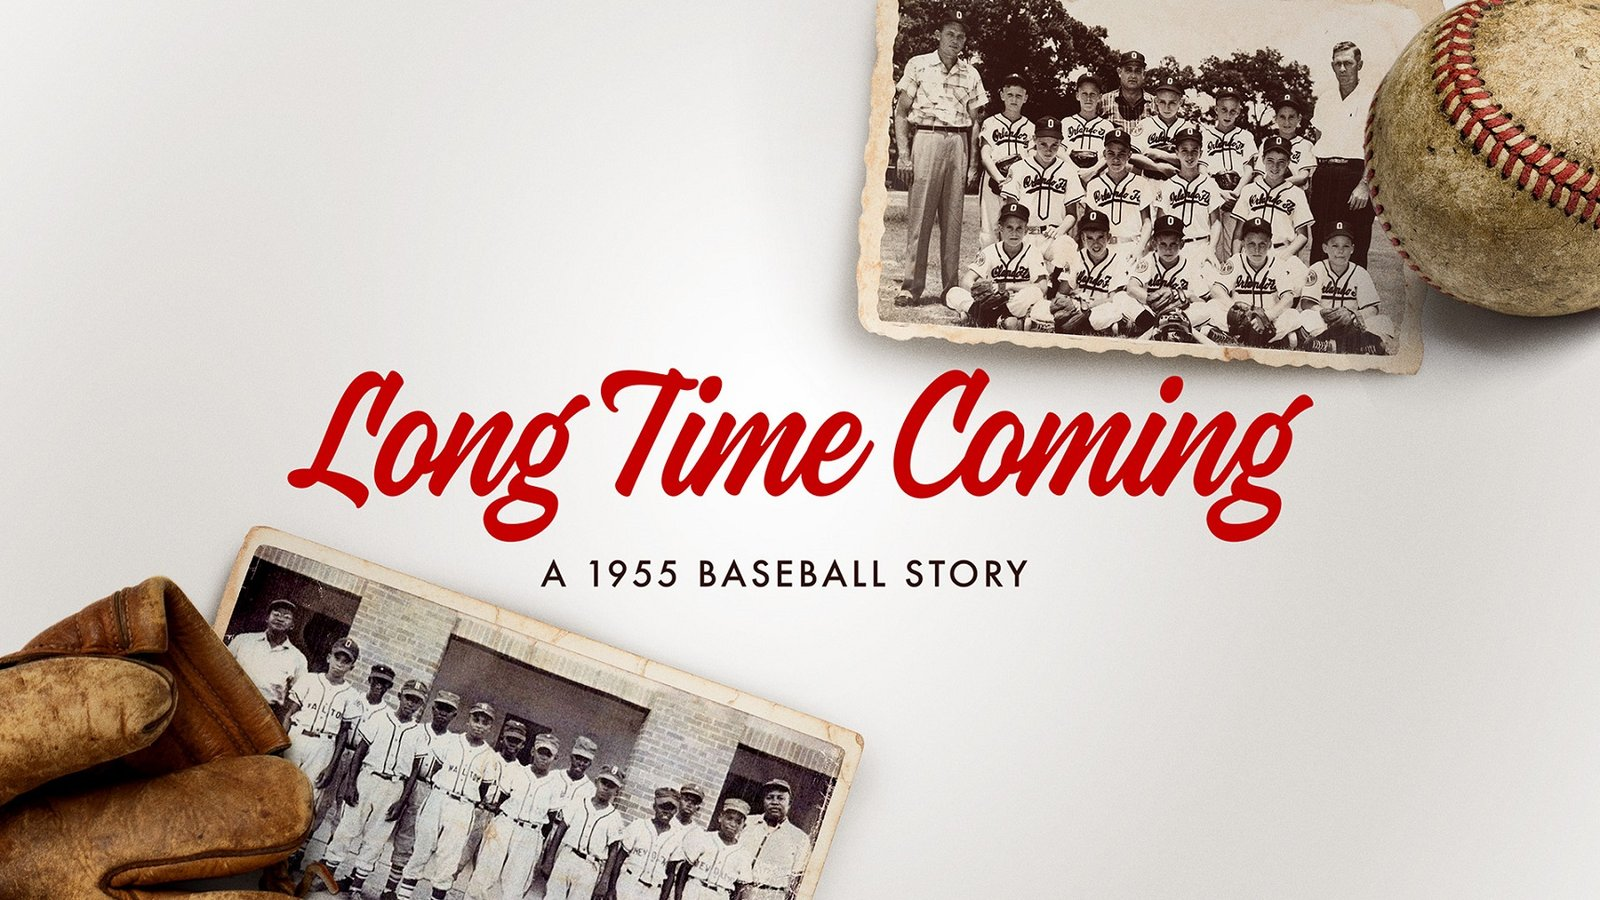 Long Time Coming - A 1955 Baseball Story